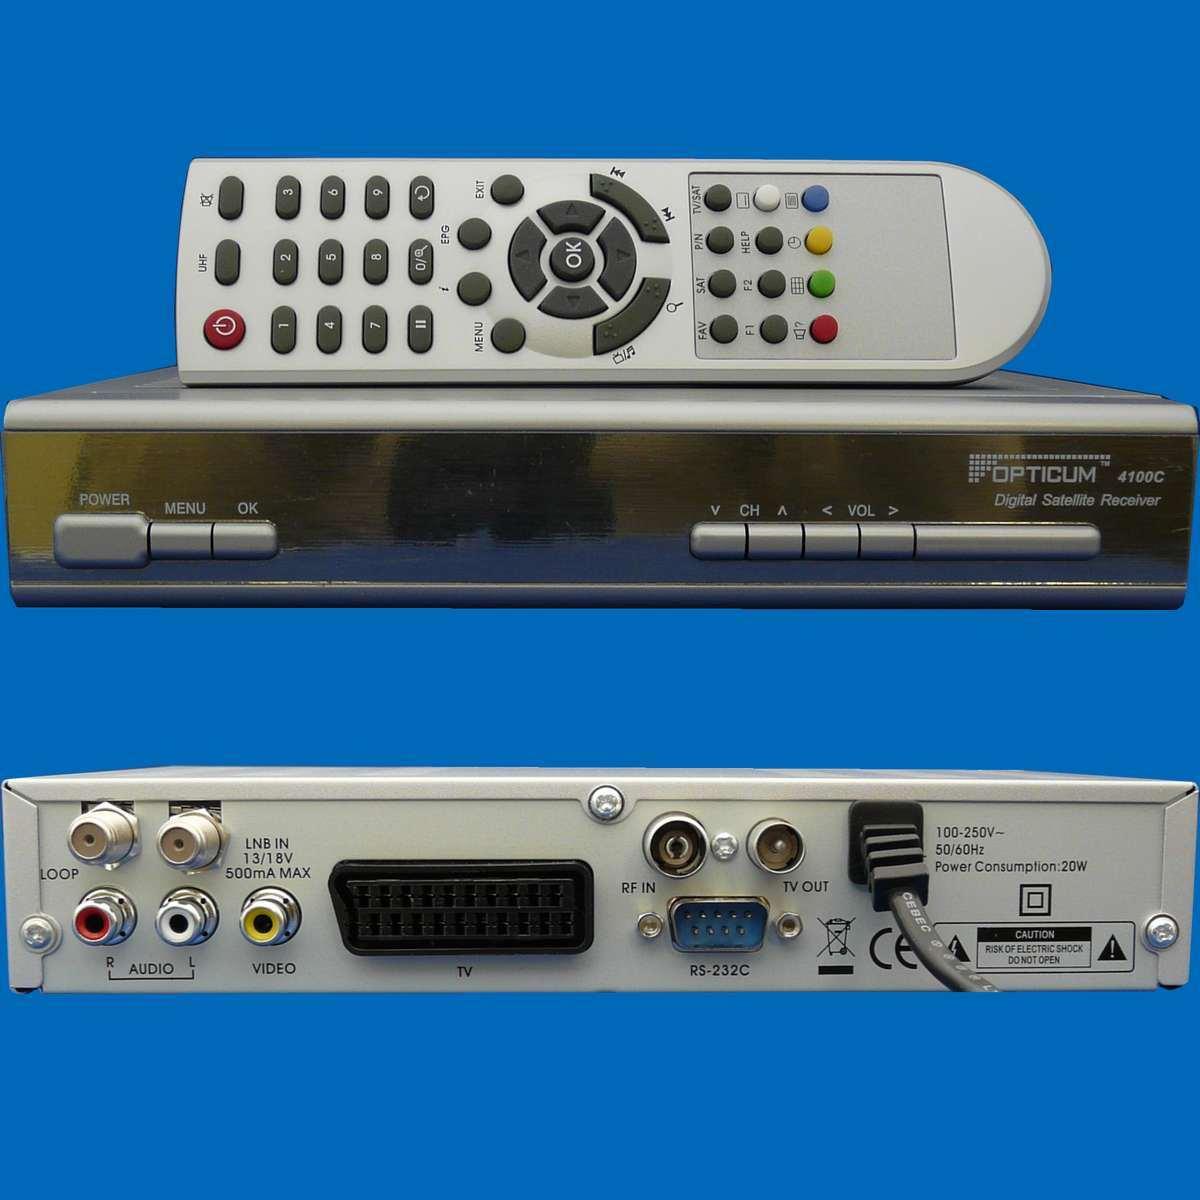 china fta digital satellite receiver china fta dvb s. Black Bedroom Furniture Sets. Home Design Ideas